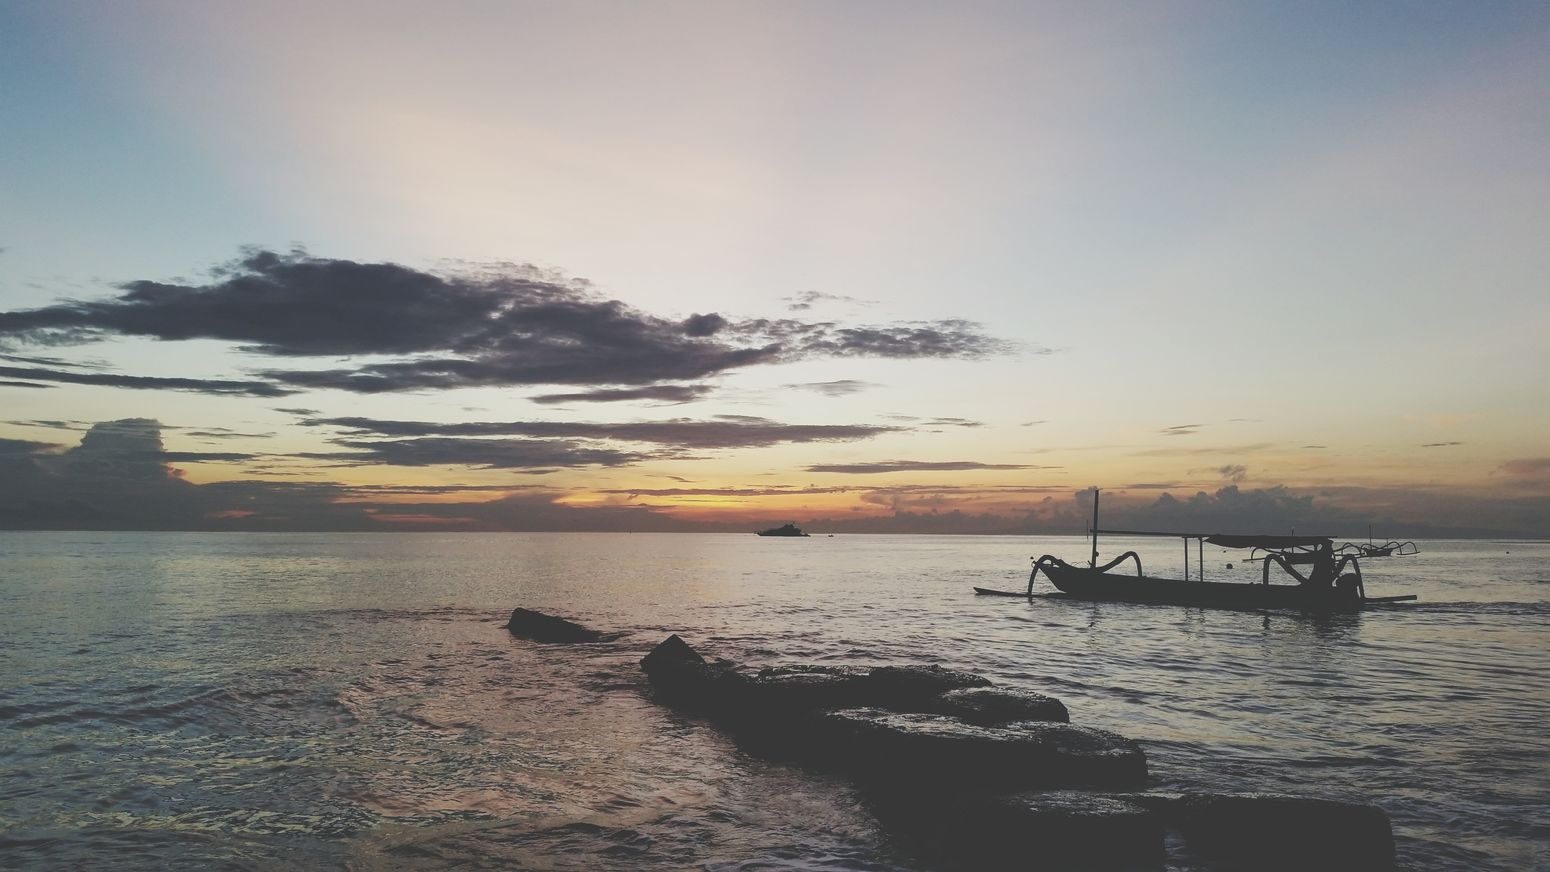 Balisunrise Sunrise Traveling LivingLife Bali, Indonesia Boats⛵️ Relaxing NatureIsBeautiful Cantgetenough